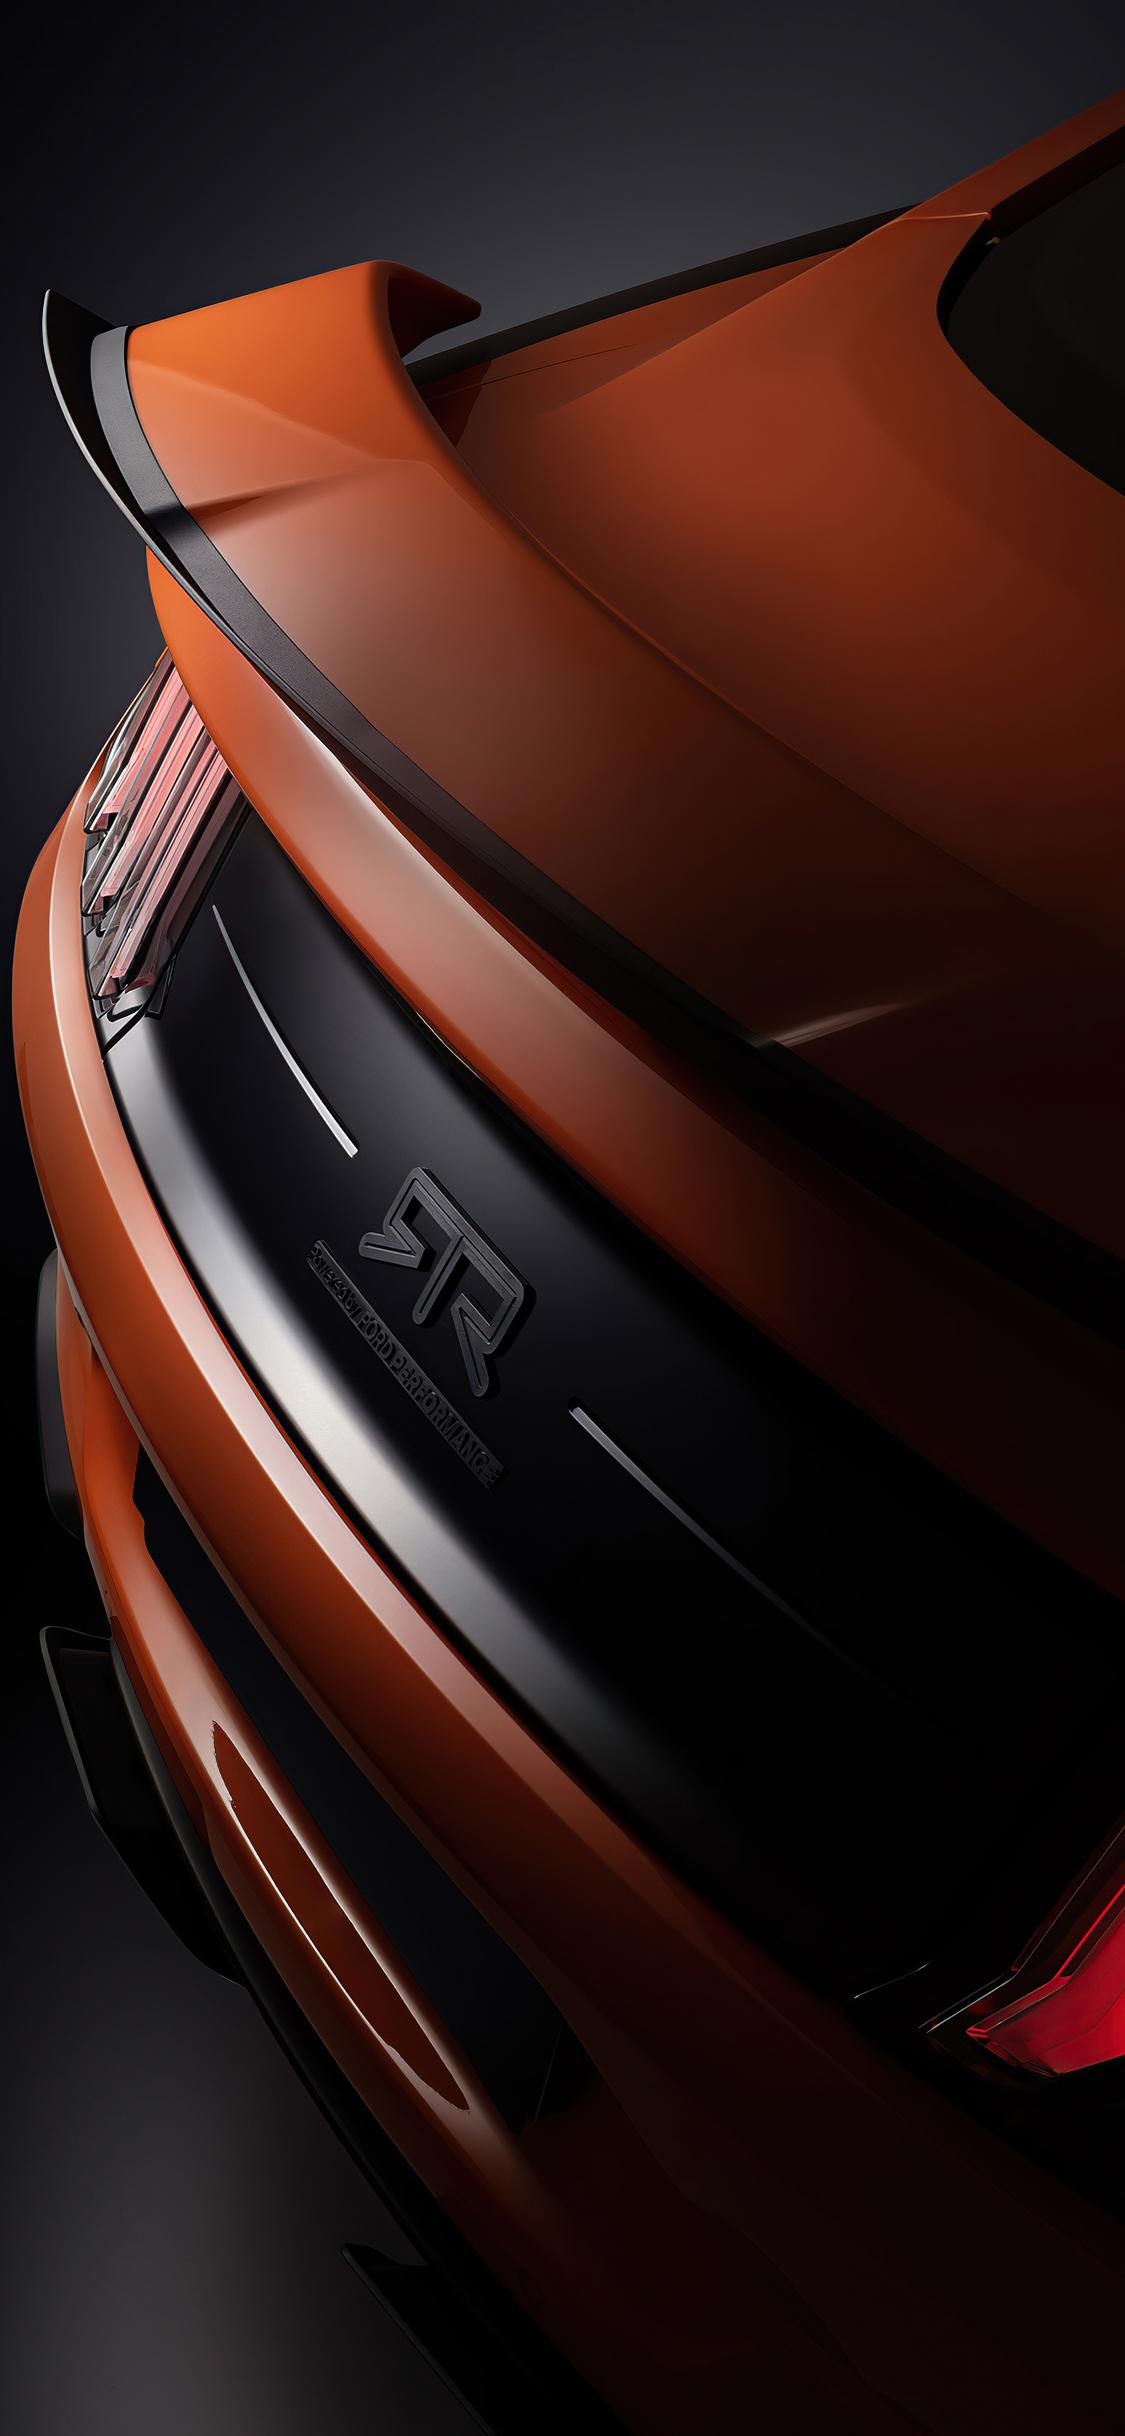 ford-mustang-rtr-ford-performance-5k-af.jpg